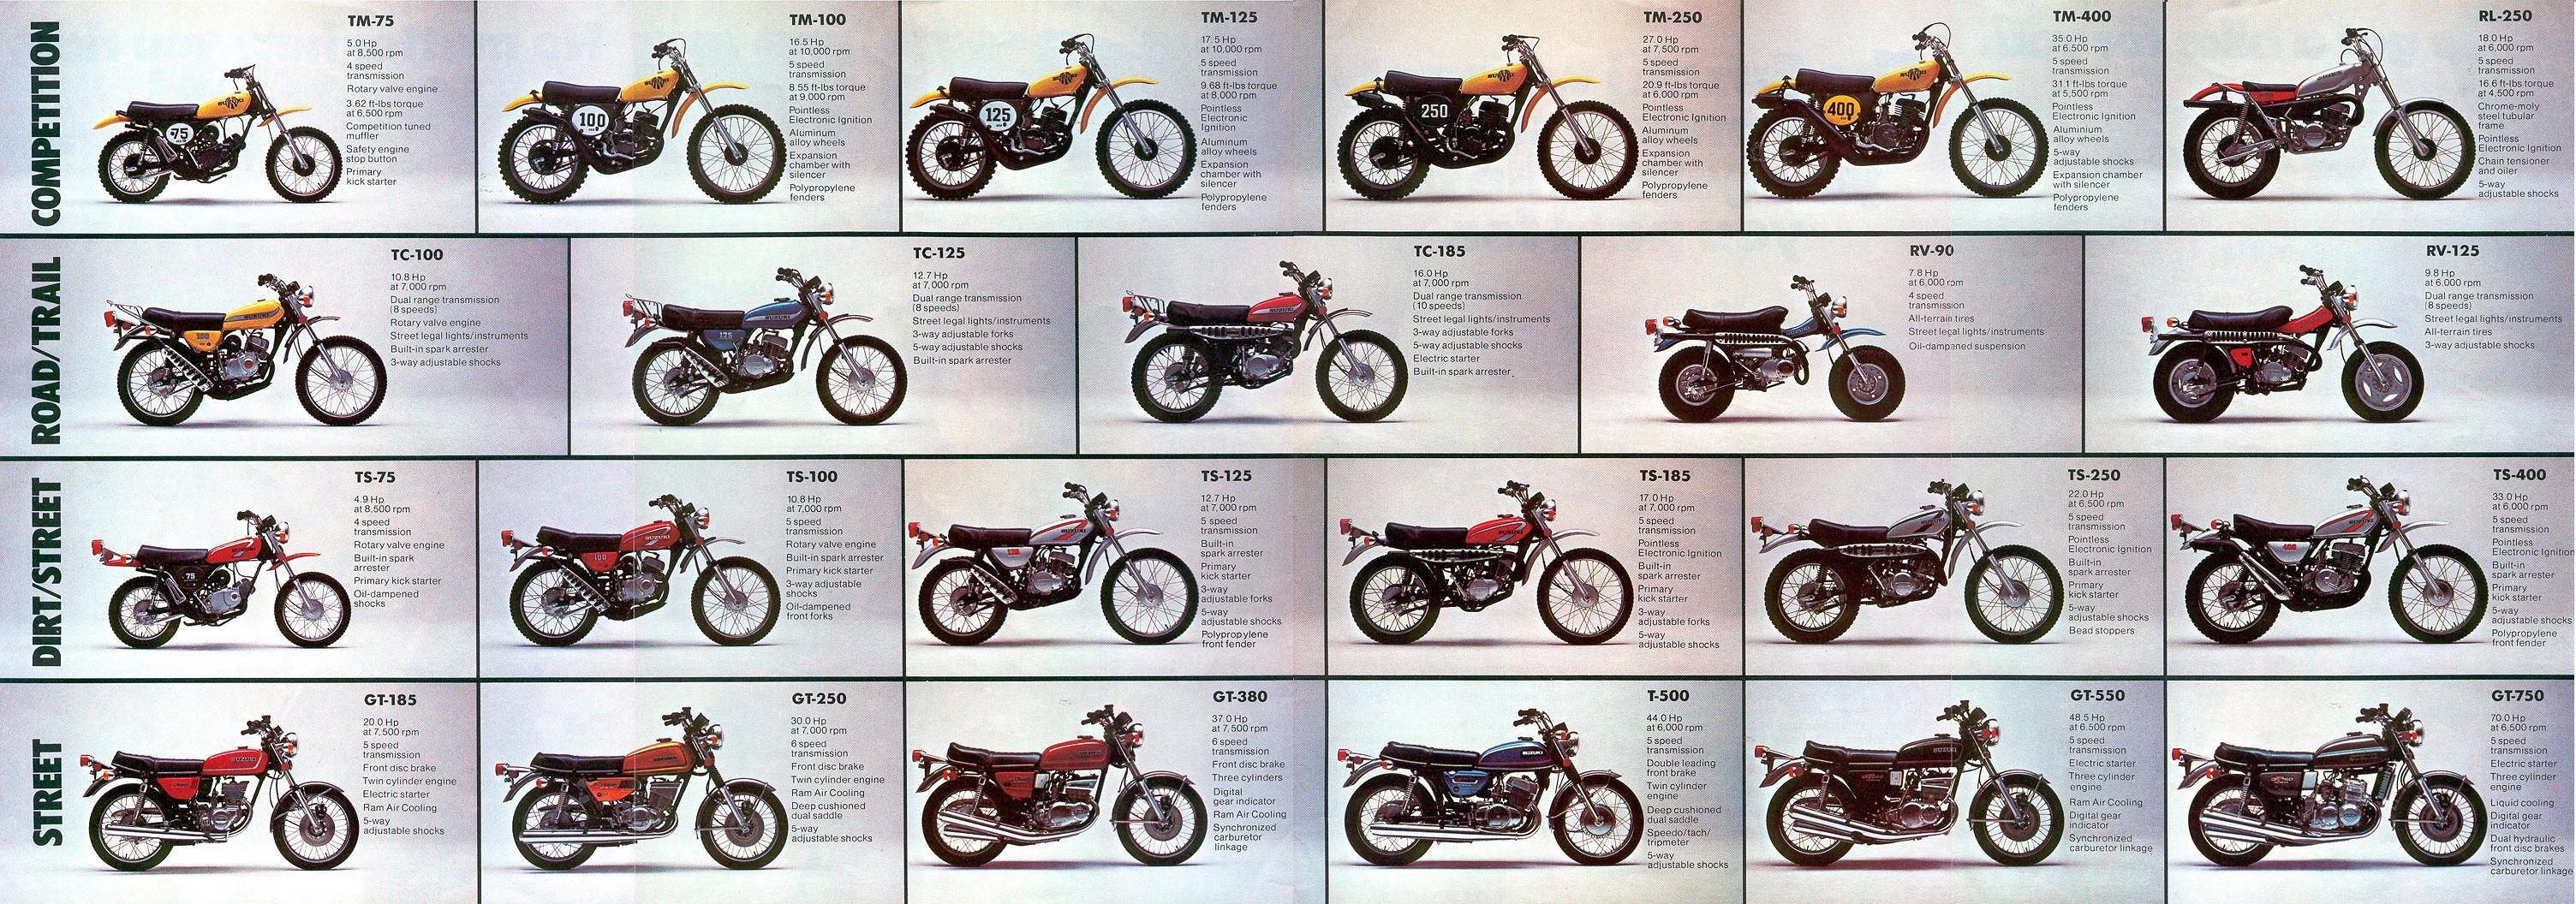 suzuki rv 50 wiring diagram haltech e6k  myrons mopeds